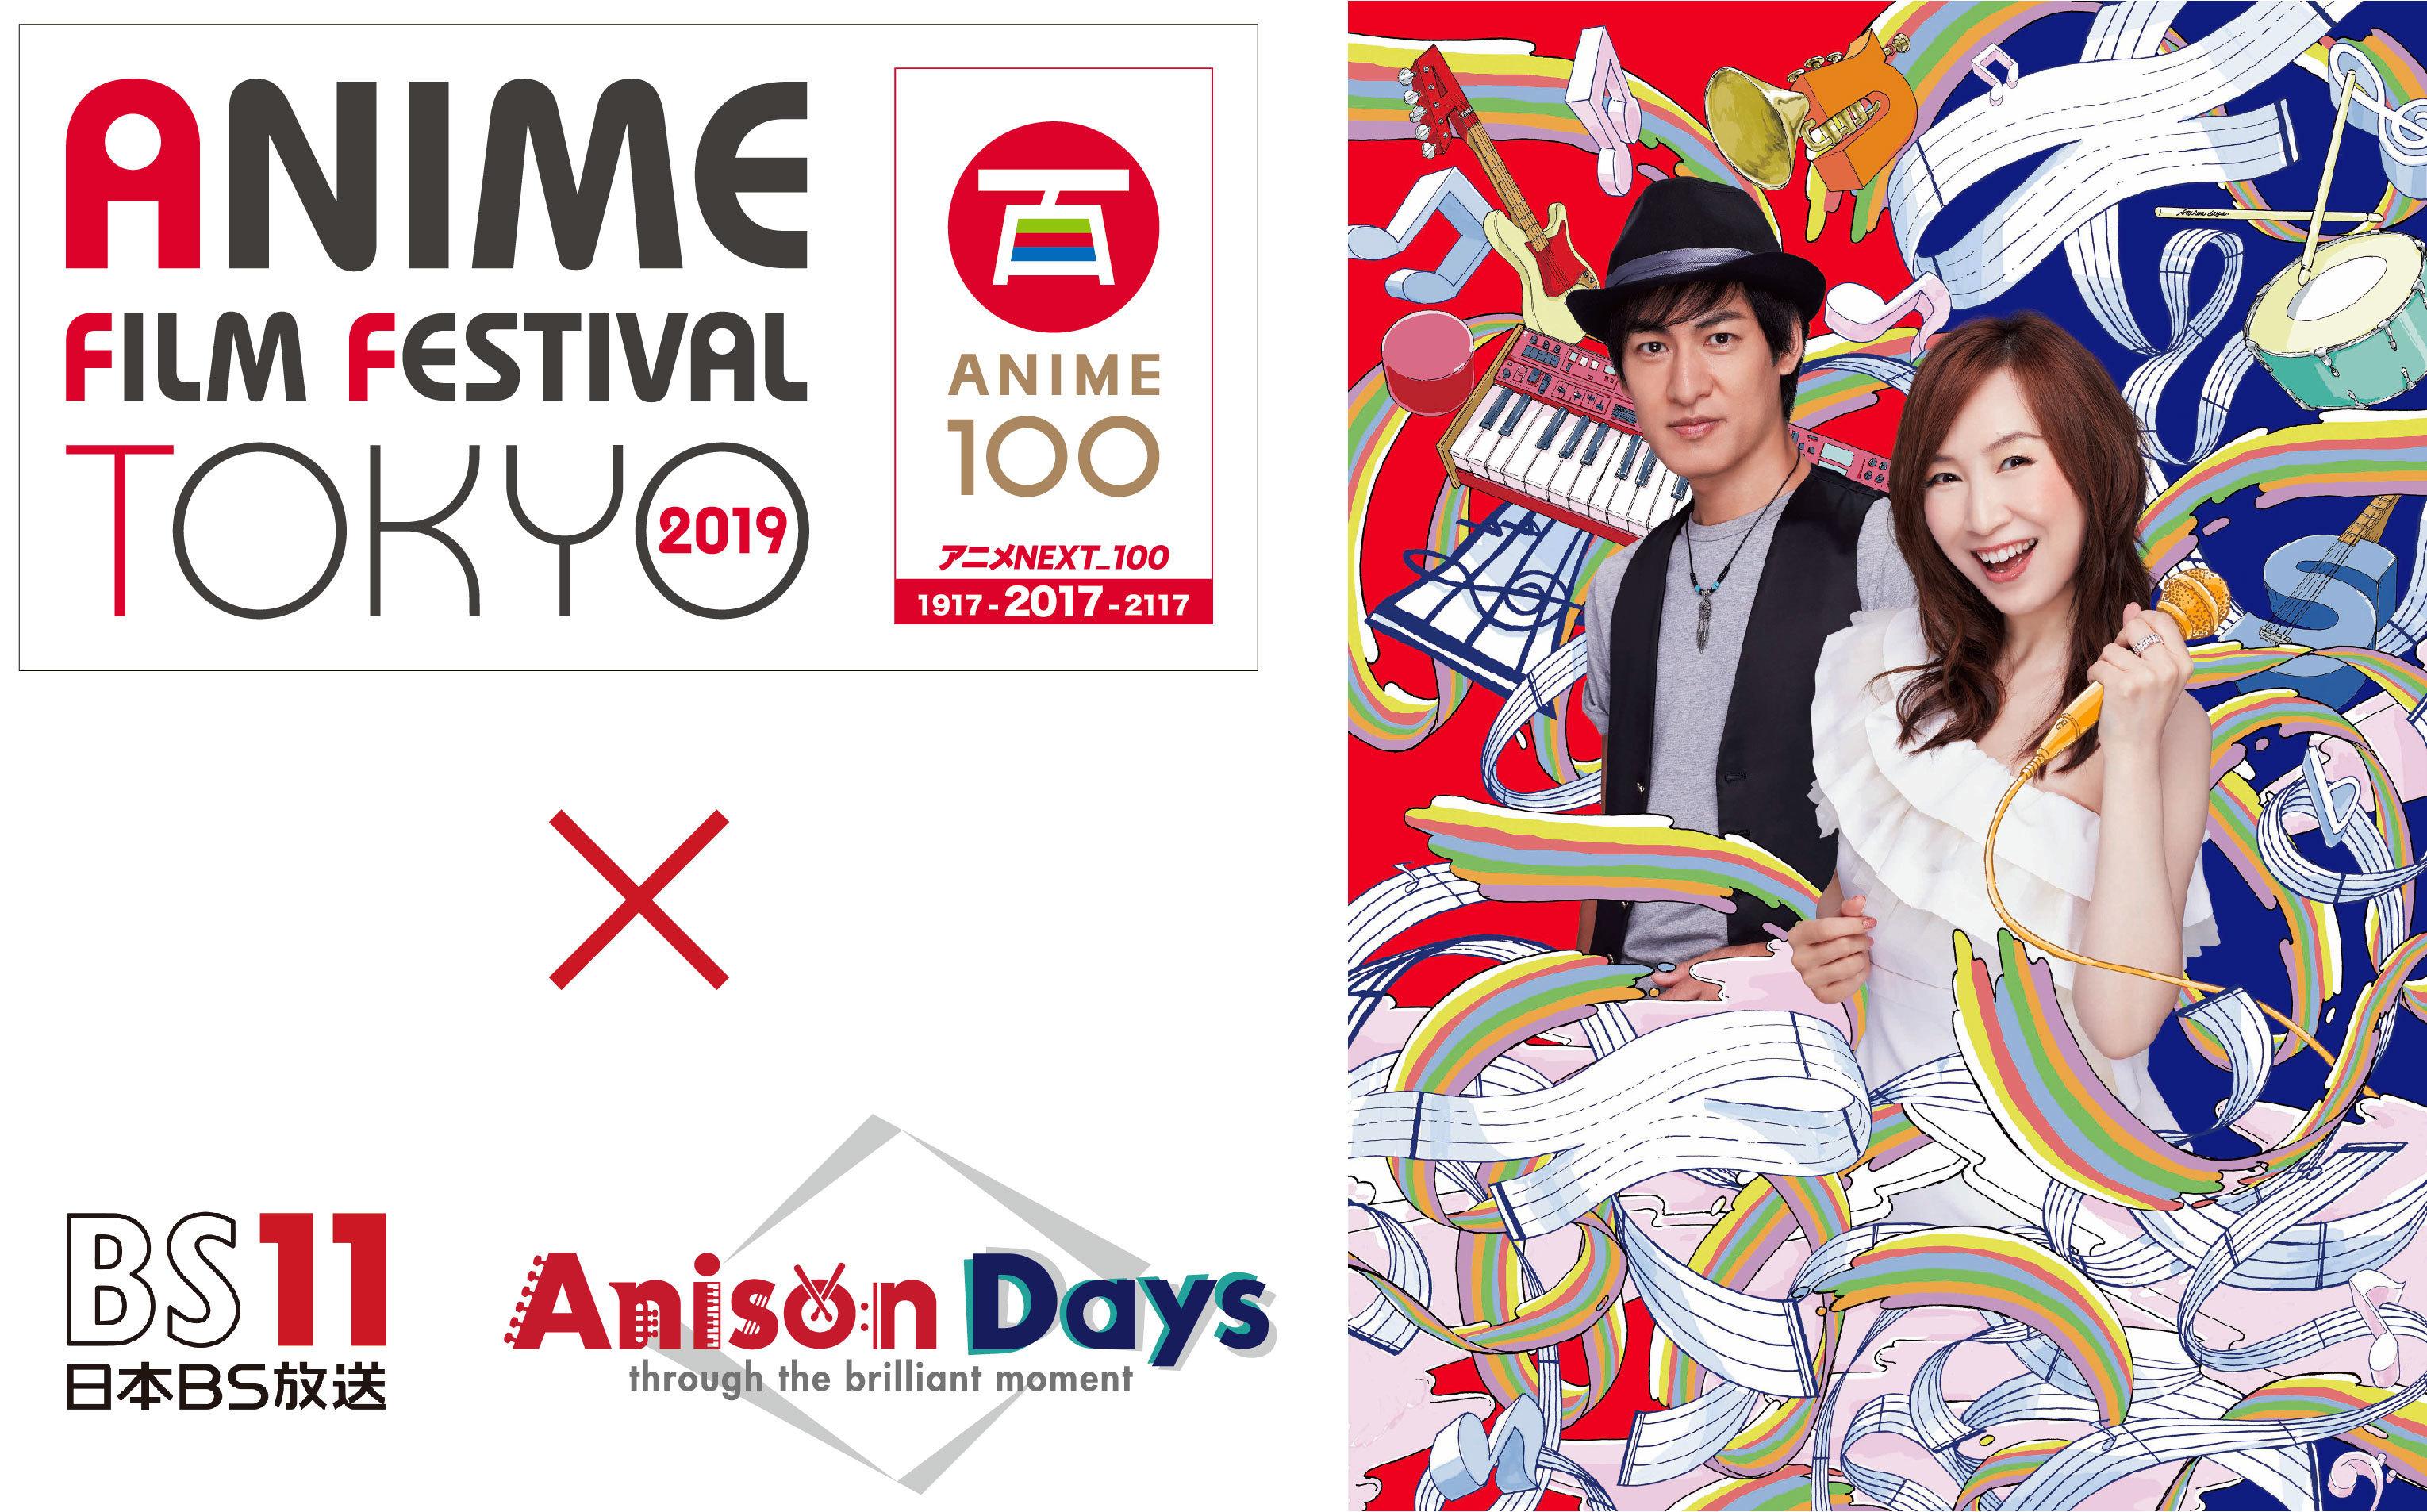 『Anison Days Festival ~アニメフィルムフェスティバル東京2019×Anison Days~』